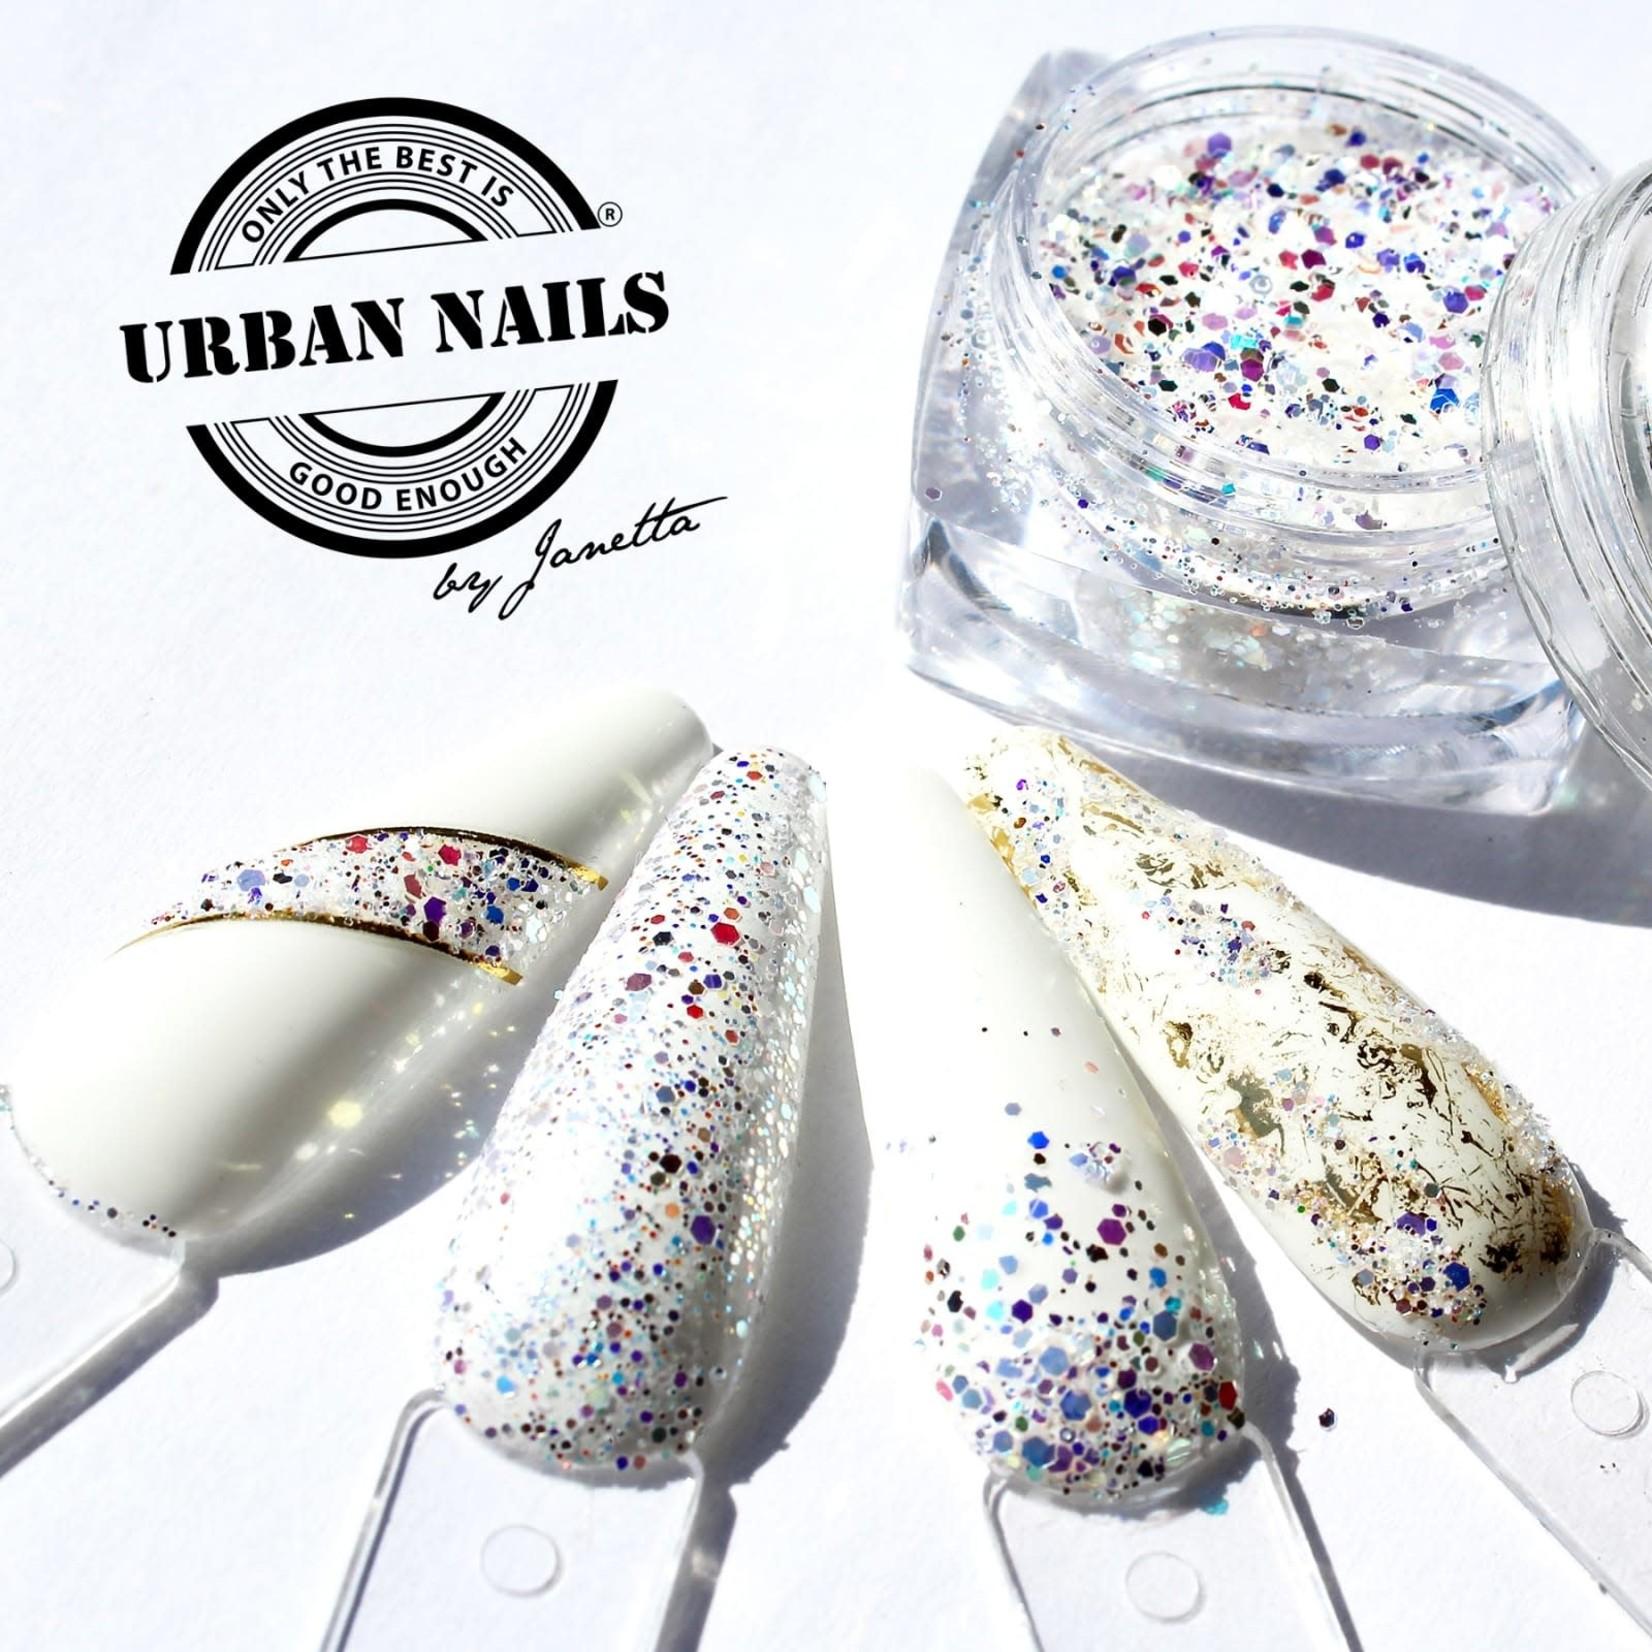 Urban Nails Pareltje van de Week 14